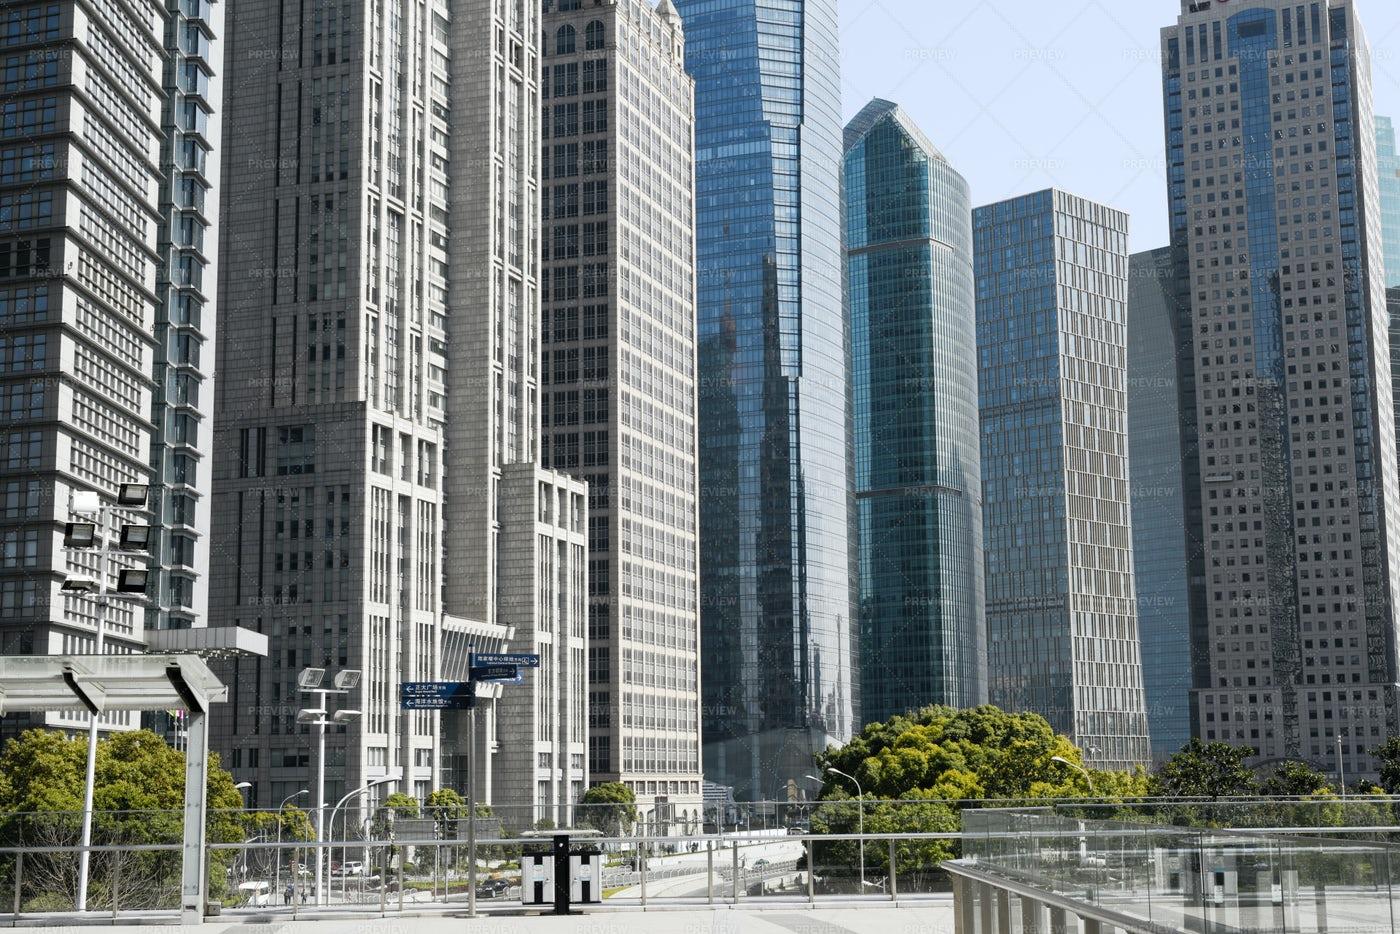 Modern Skyscrapers In Shanghai: Stock Photos